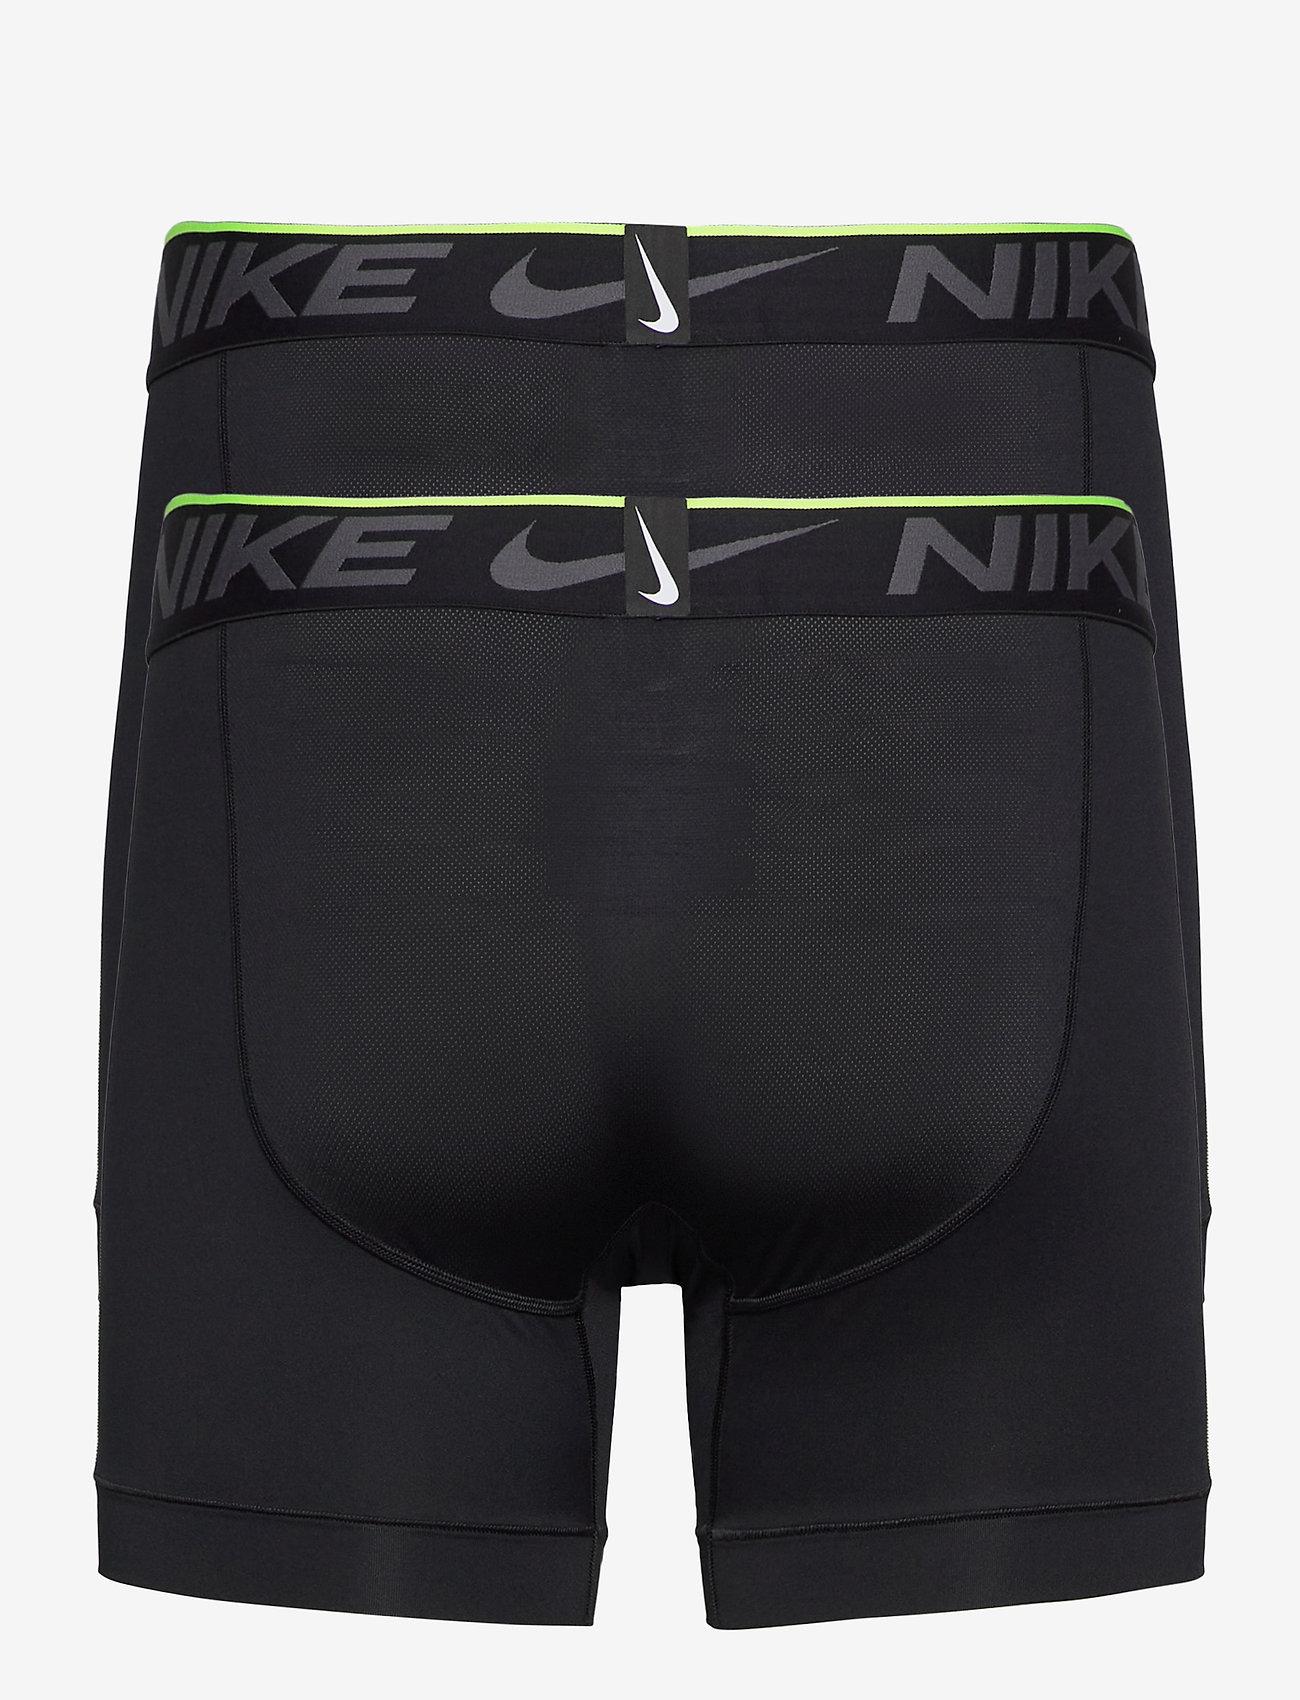 NIKE BOXER BRIEF 2PK - Boxershortser BLACK/BLACK - Menn Klær